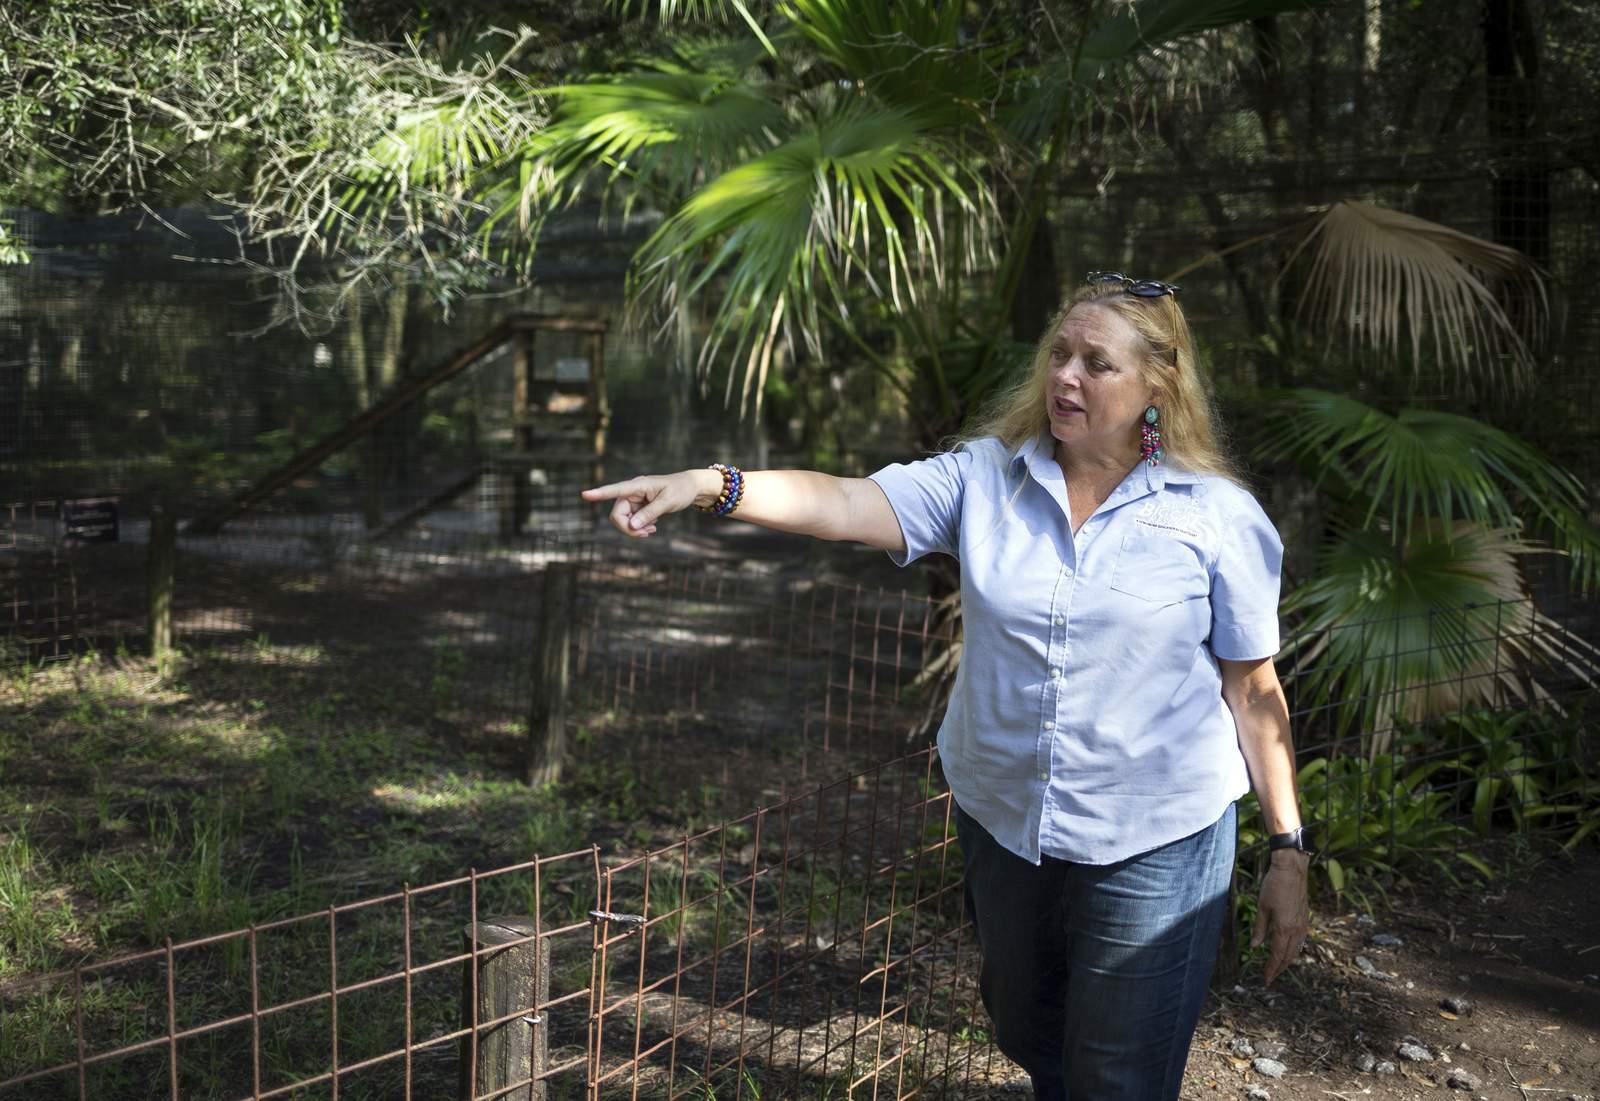 FILE - In this July 20, 2017, file photo, Carole Baskin, founder of Big Cat Rescue, walks the property near Tampa, Fla. (Loren Elliott/Tampa Bay Times via AP, File)